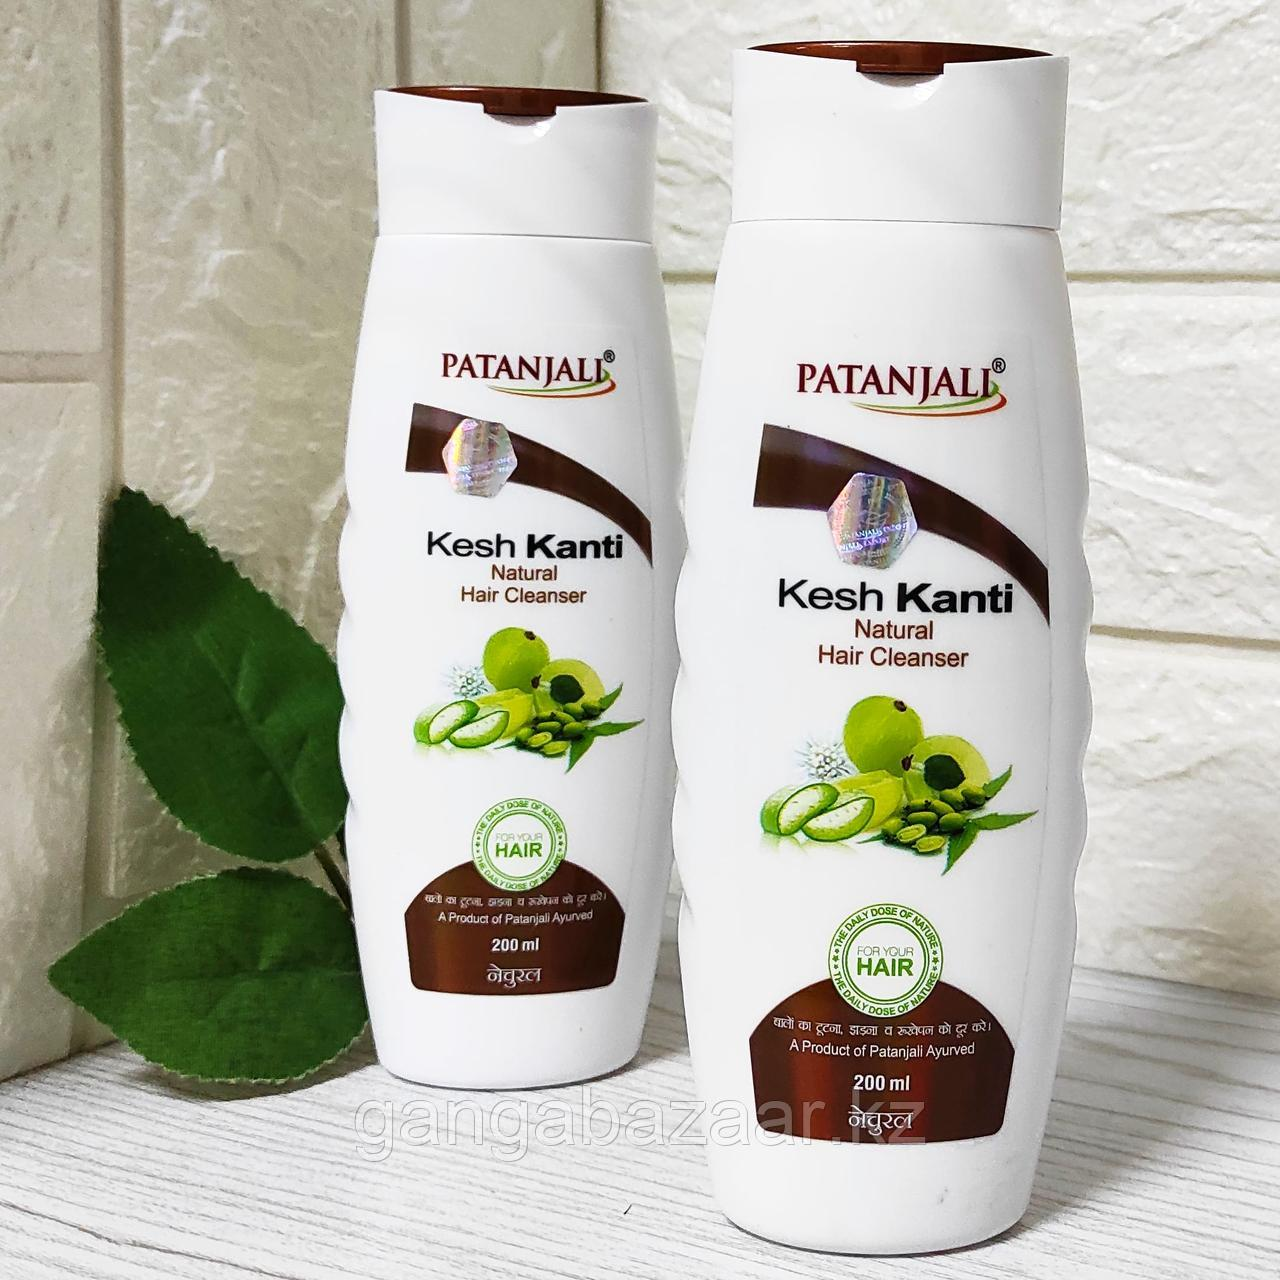 Шампунь НАТУРАЛ Кеш Канти (KESH KANTI NATURAL HAIR CLEANSER), Патанджали (Patanjali), 200 мл